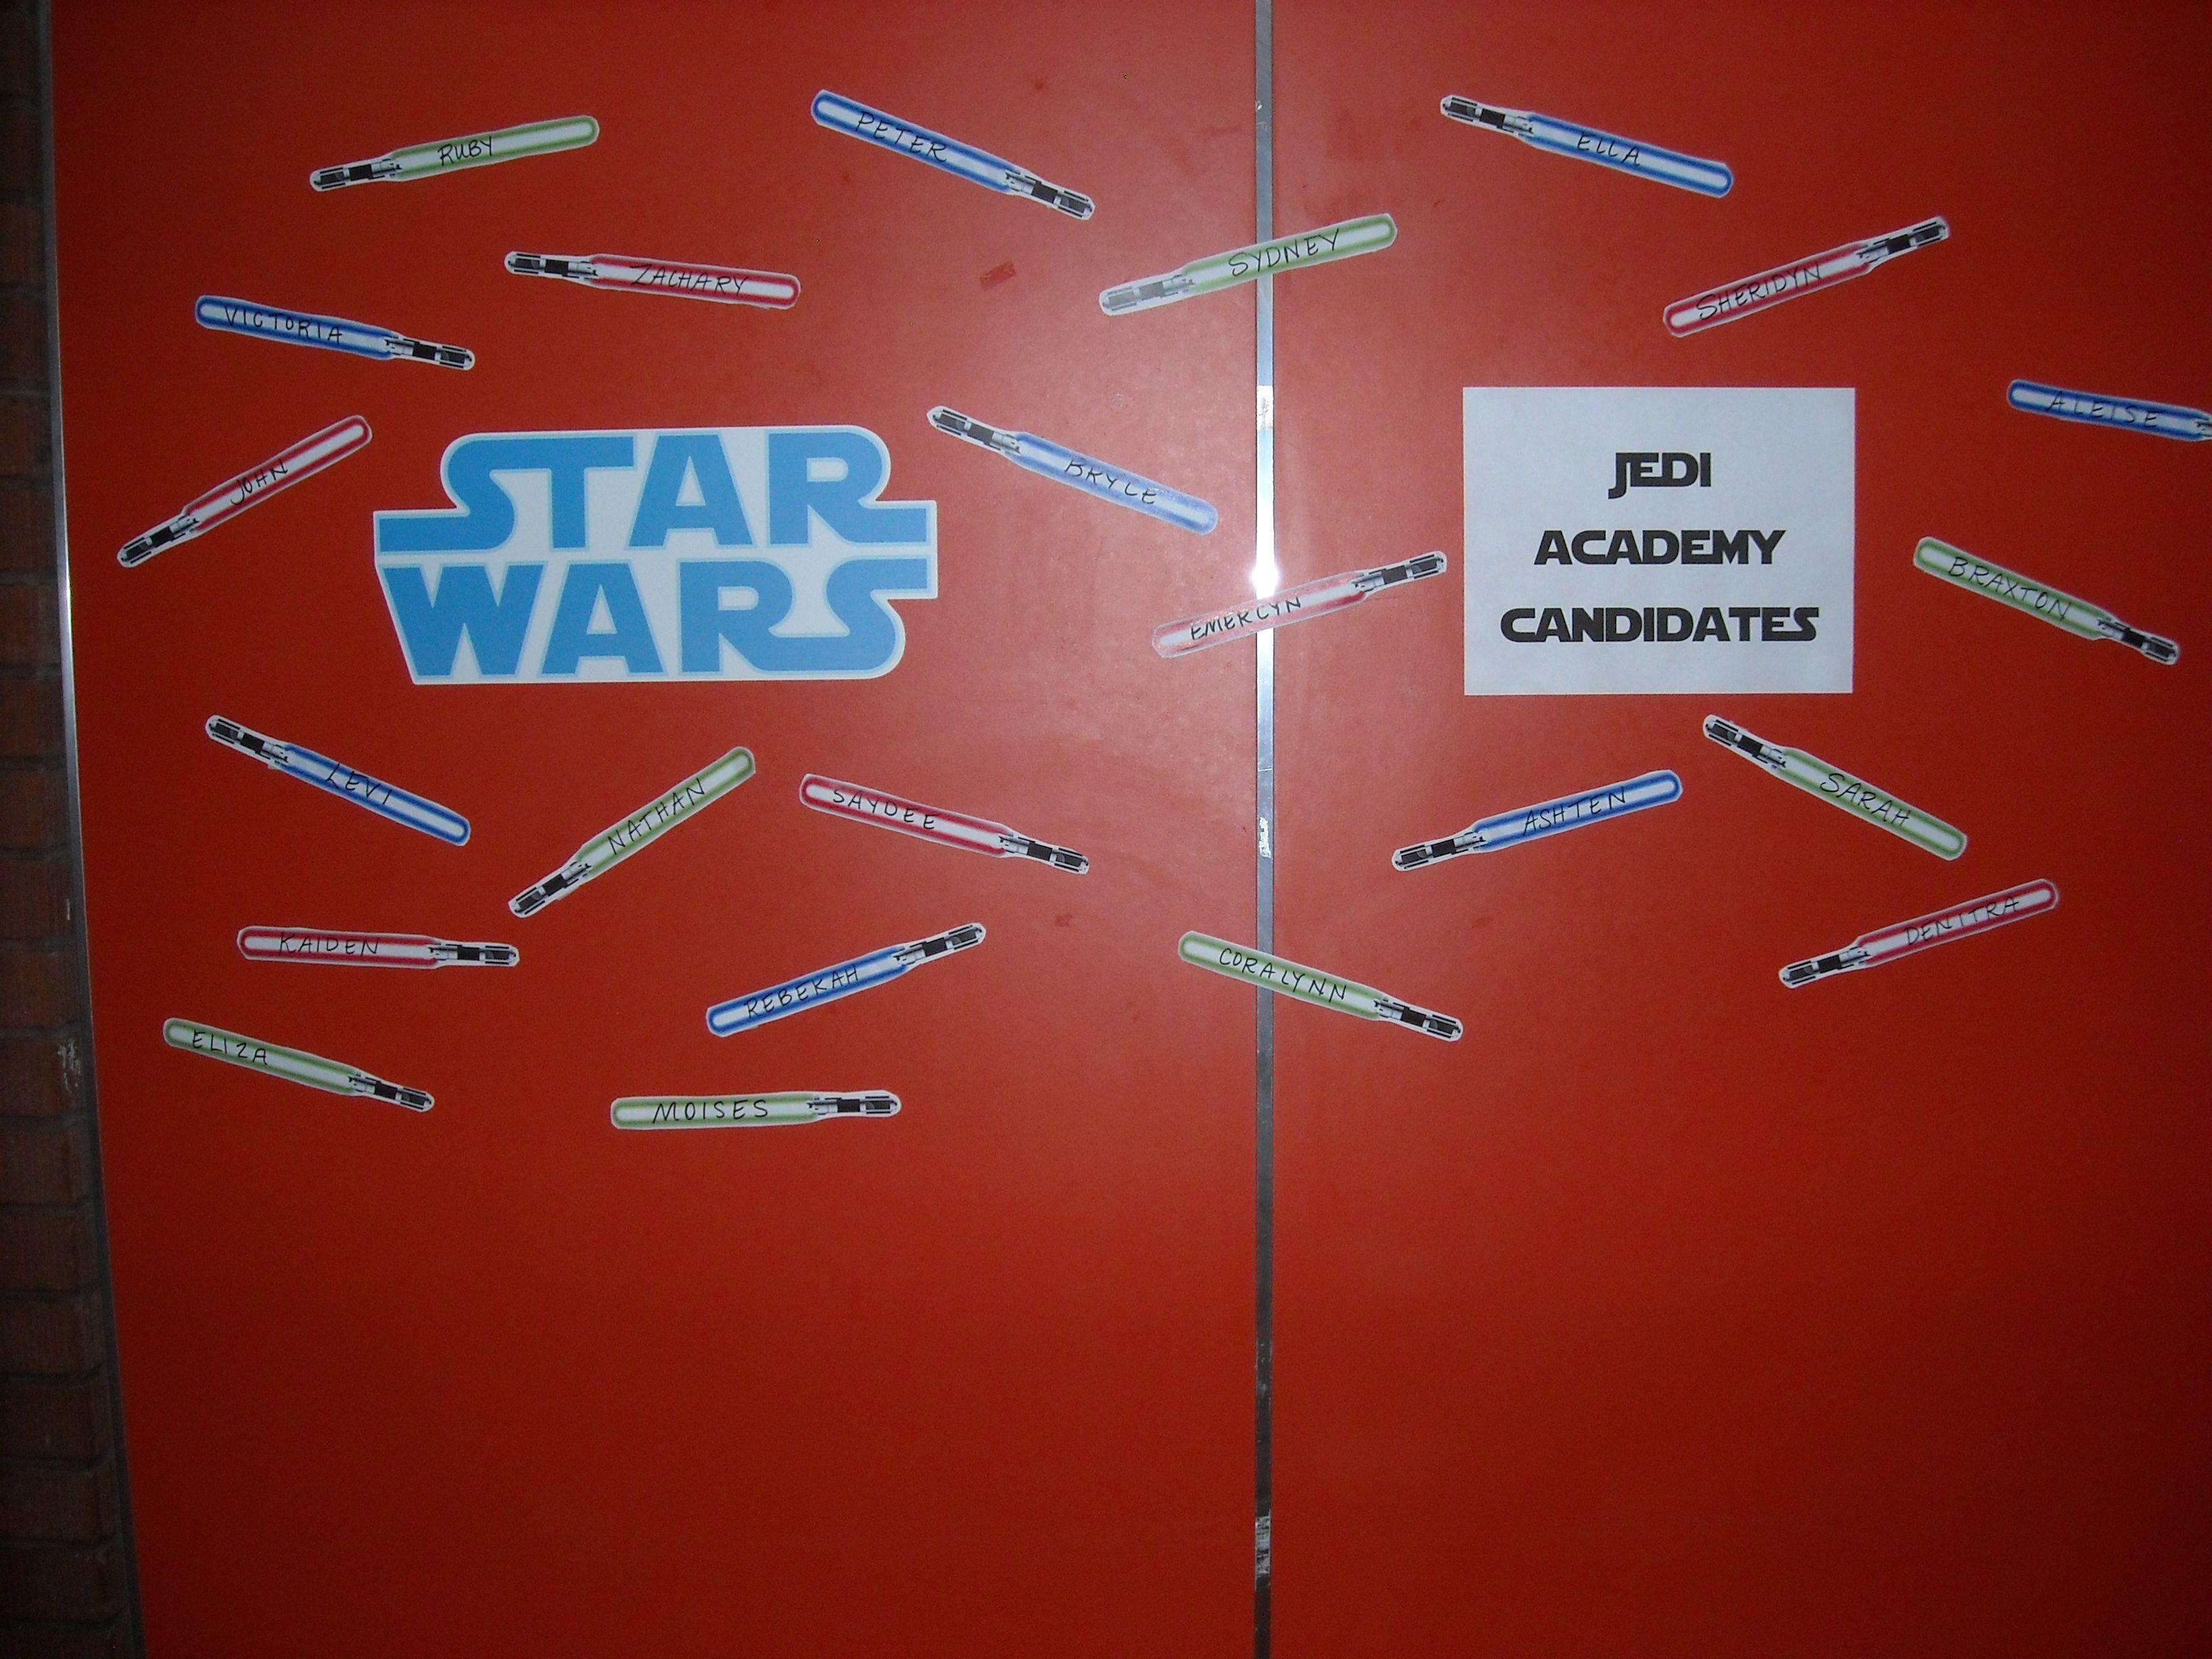 Jedi Academy Candidates